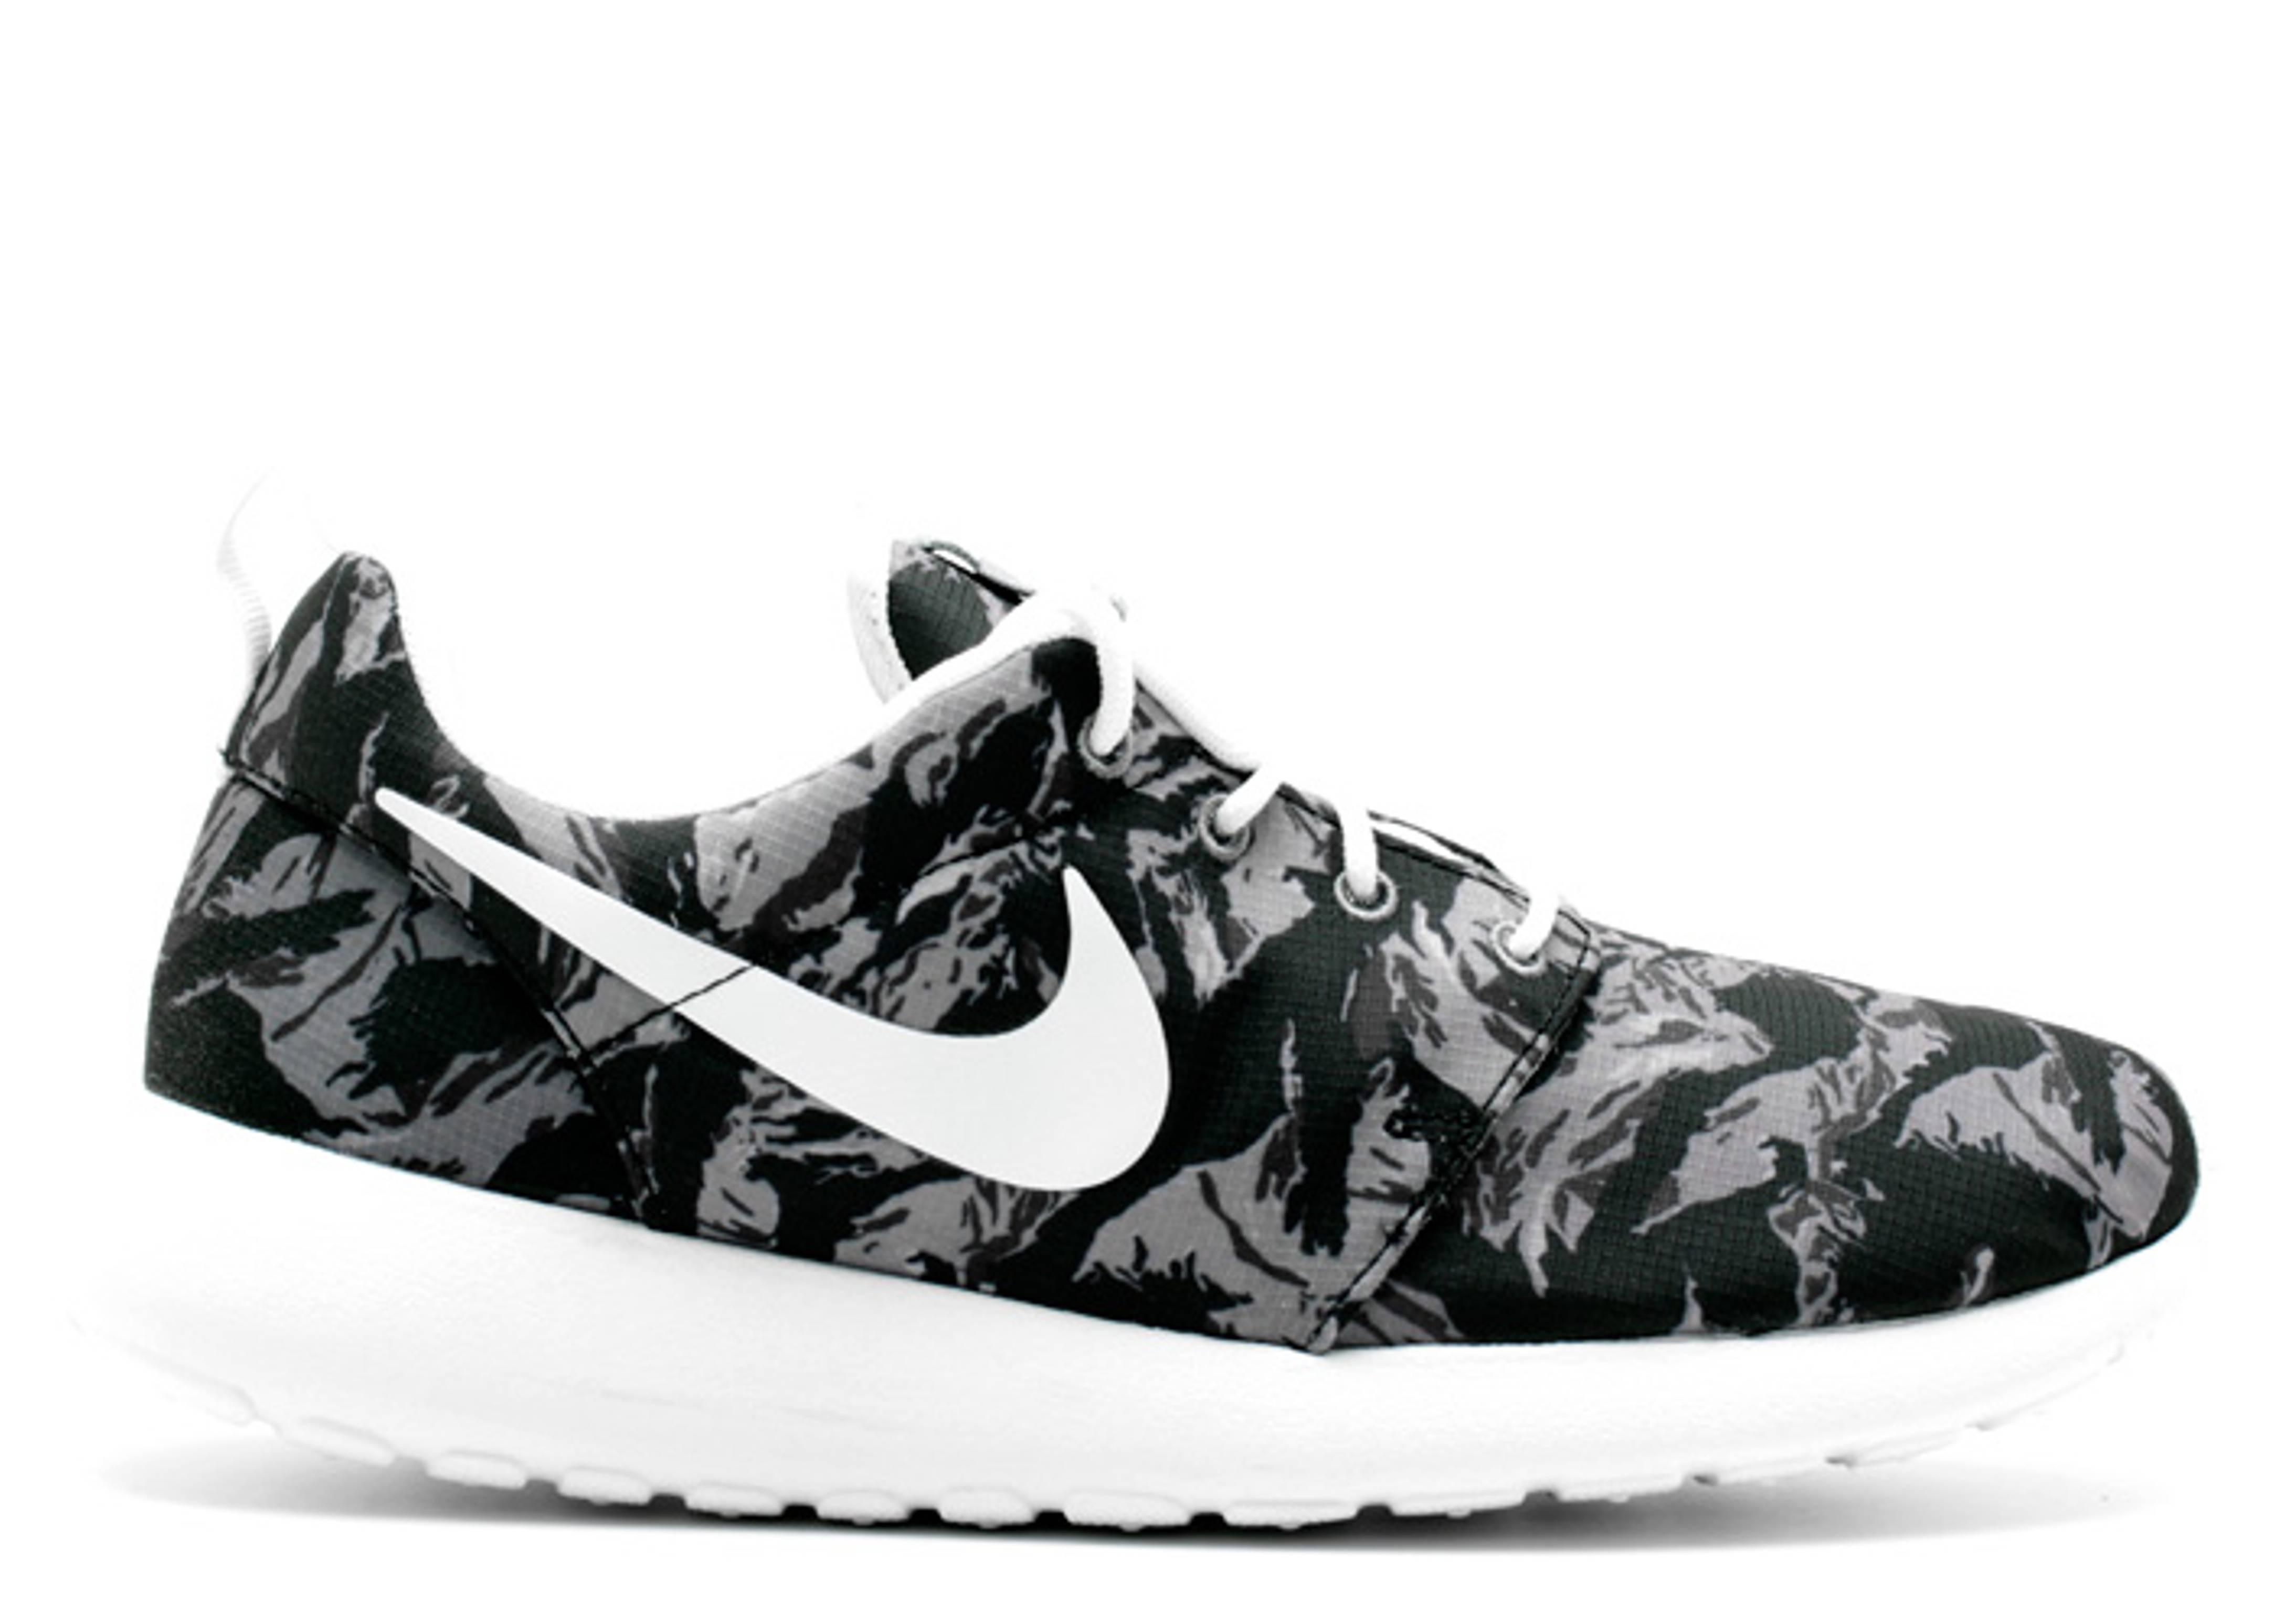 c0d899ac8cd1 Rosherun Print - Nike - 655206 014 - wolf grey white-cl gry-anthrct ...